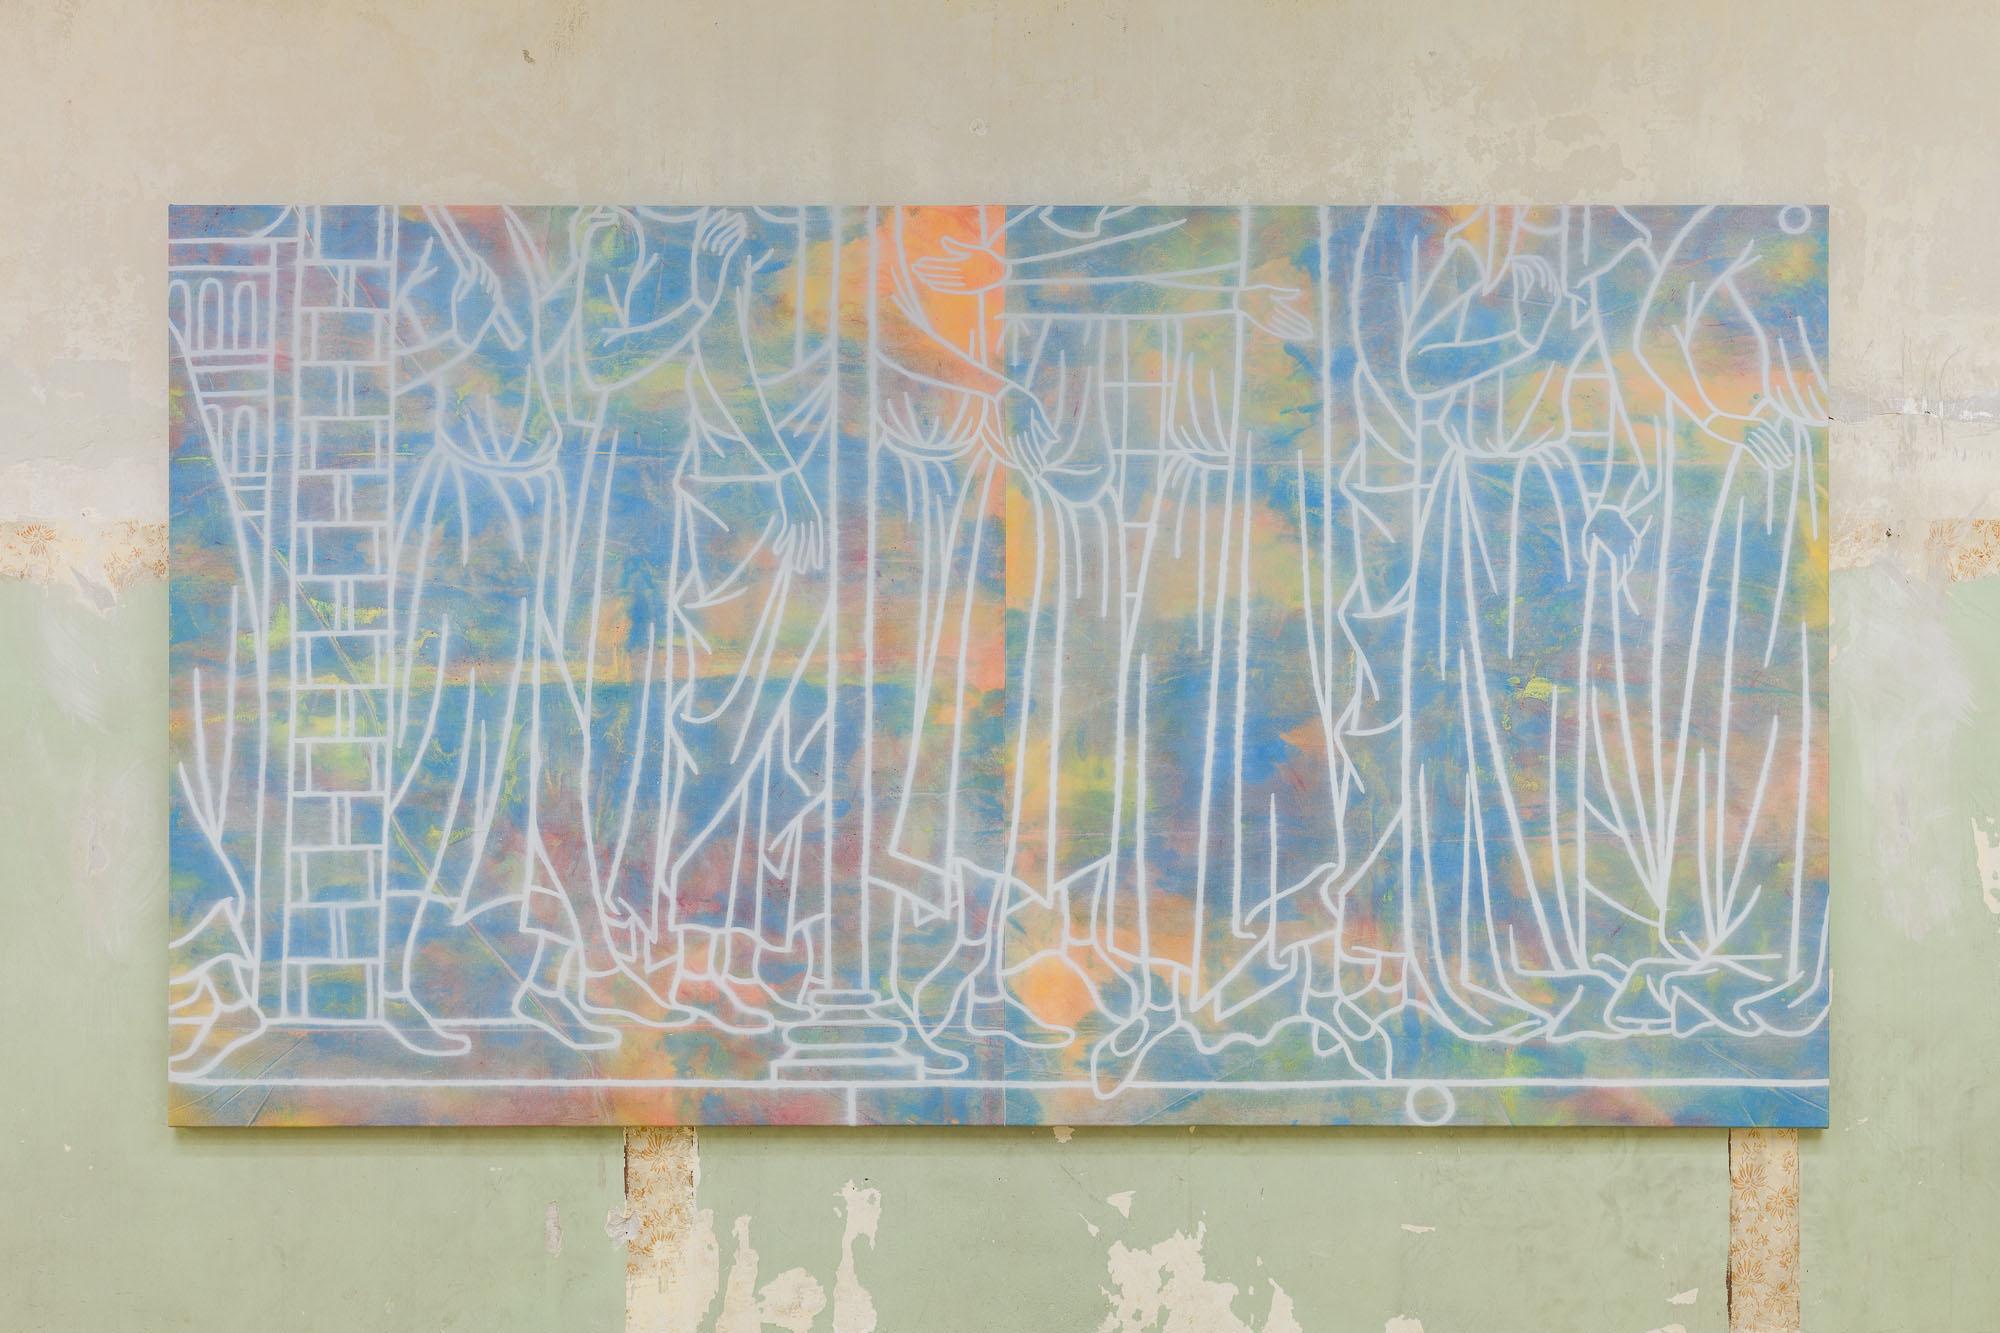 miriam stoney, aljoscha ambrosch, exhibition, duo show, international art